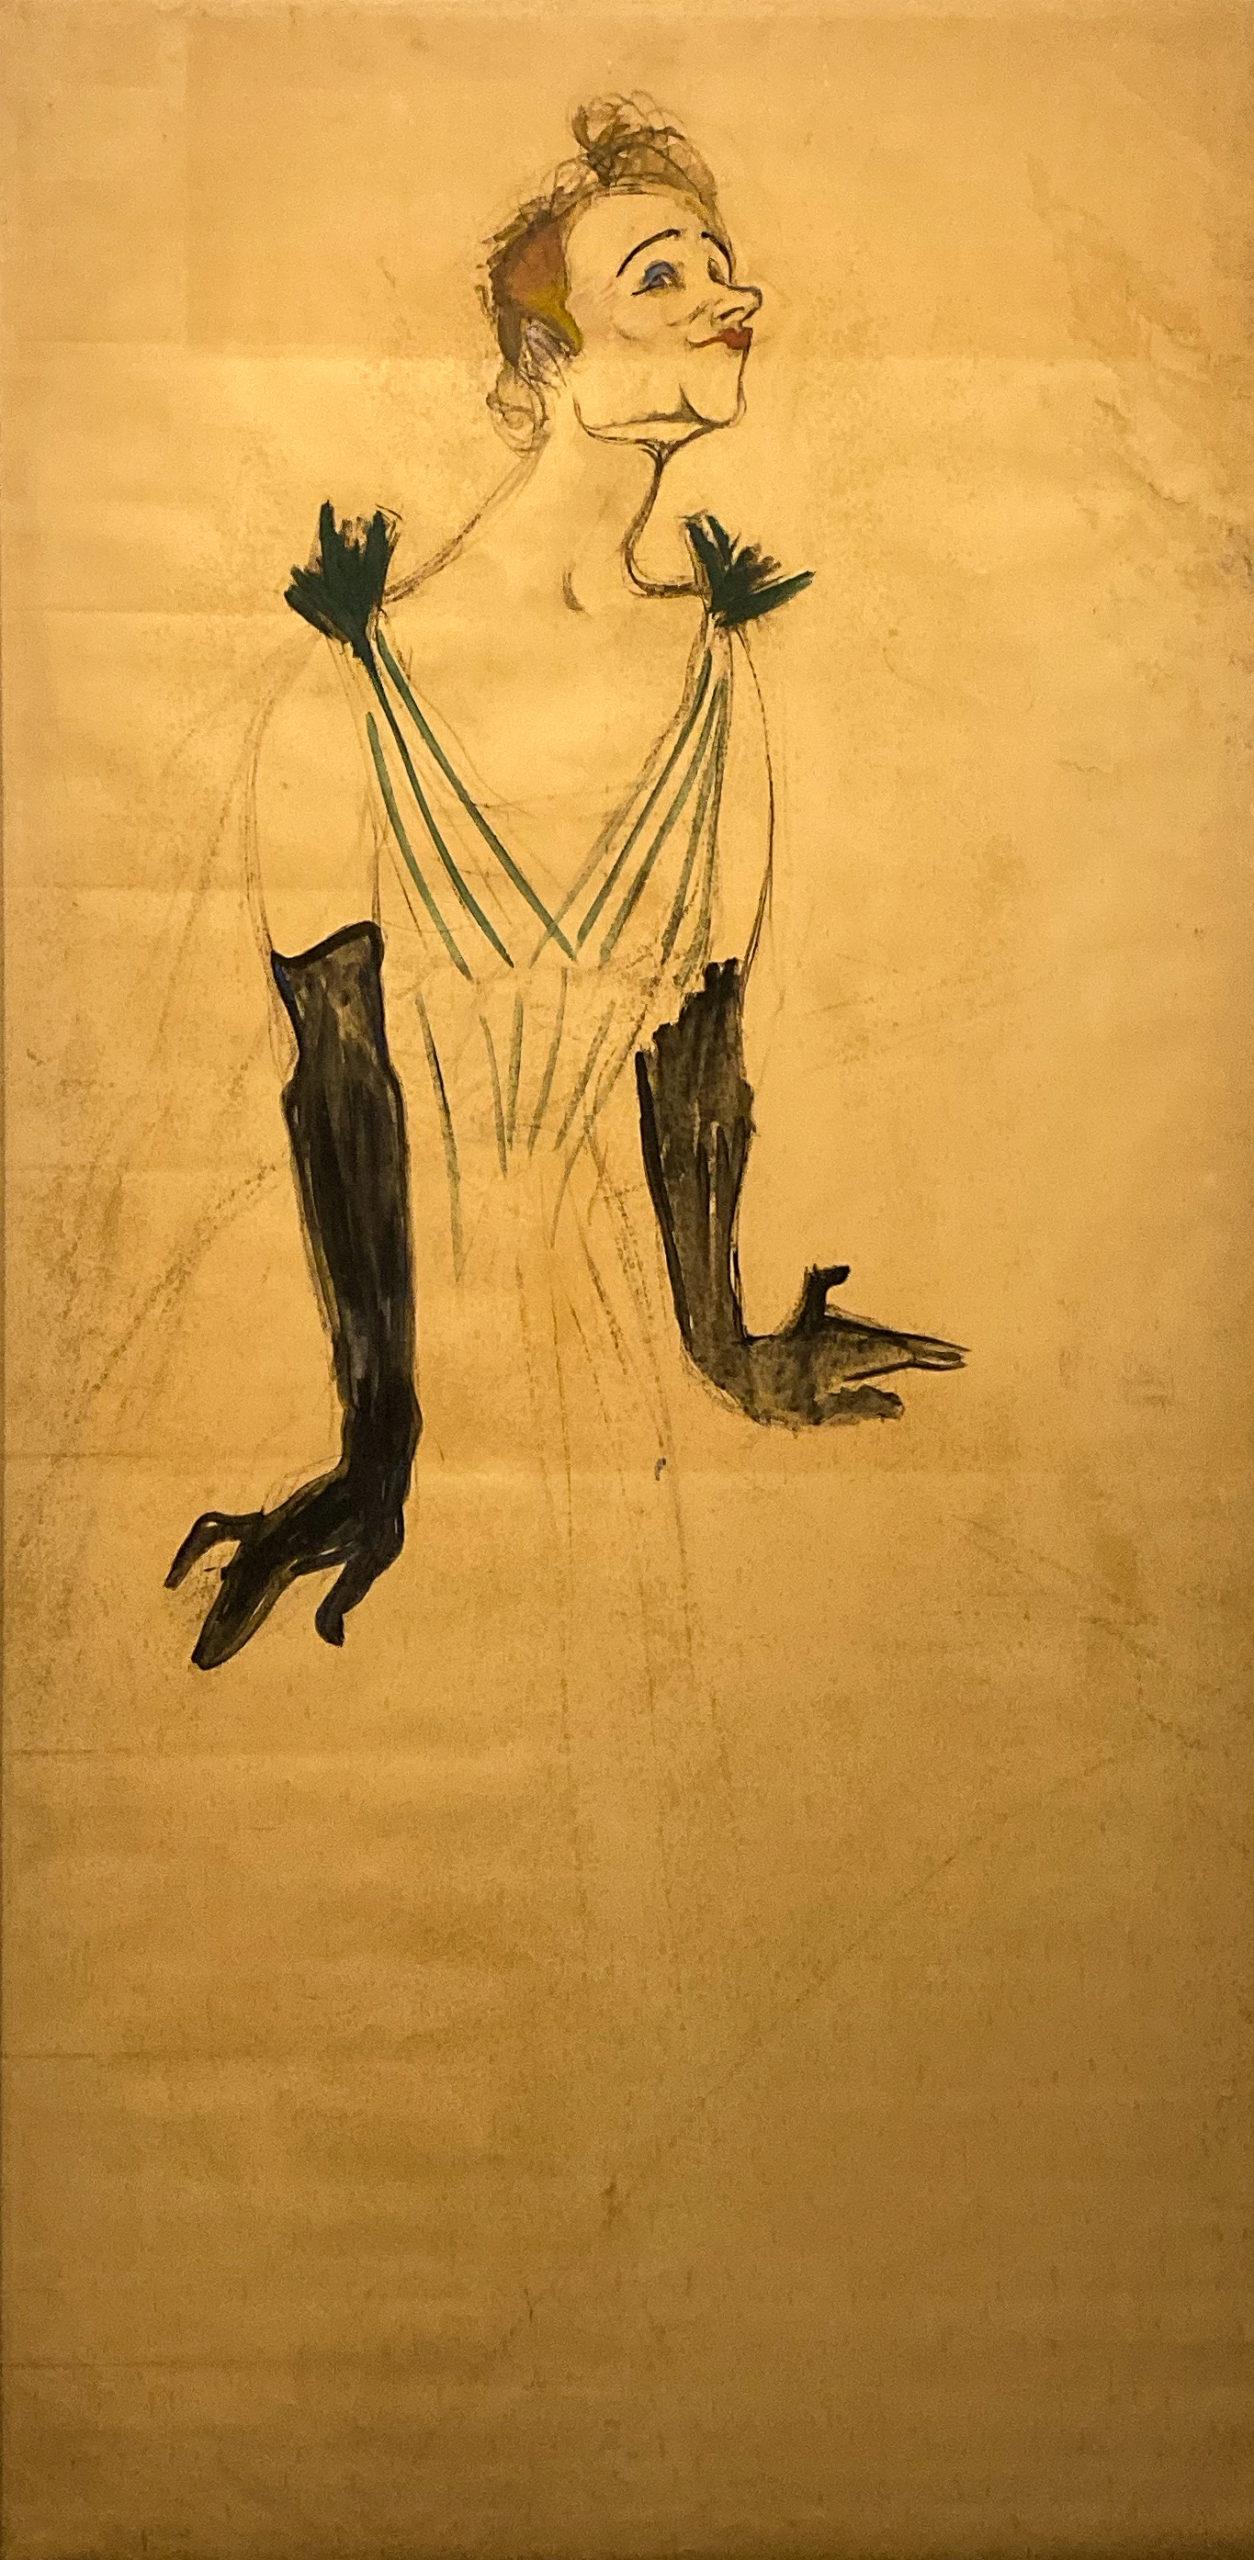 Toulouse-Lautrec im Grand Palais 2019/20 Yvette Guilbert